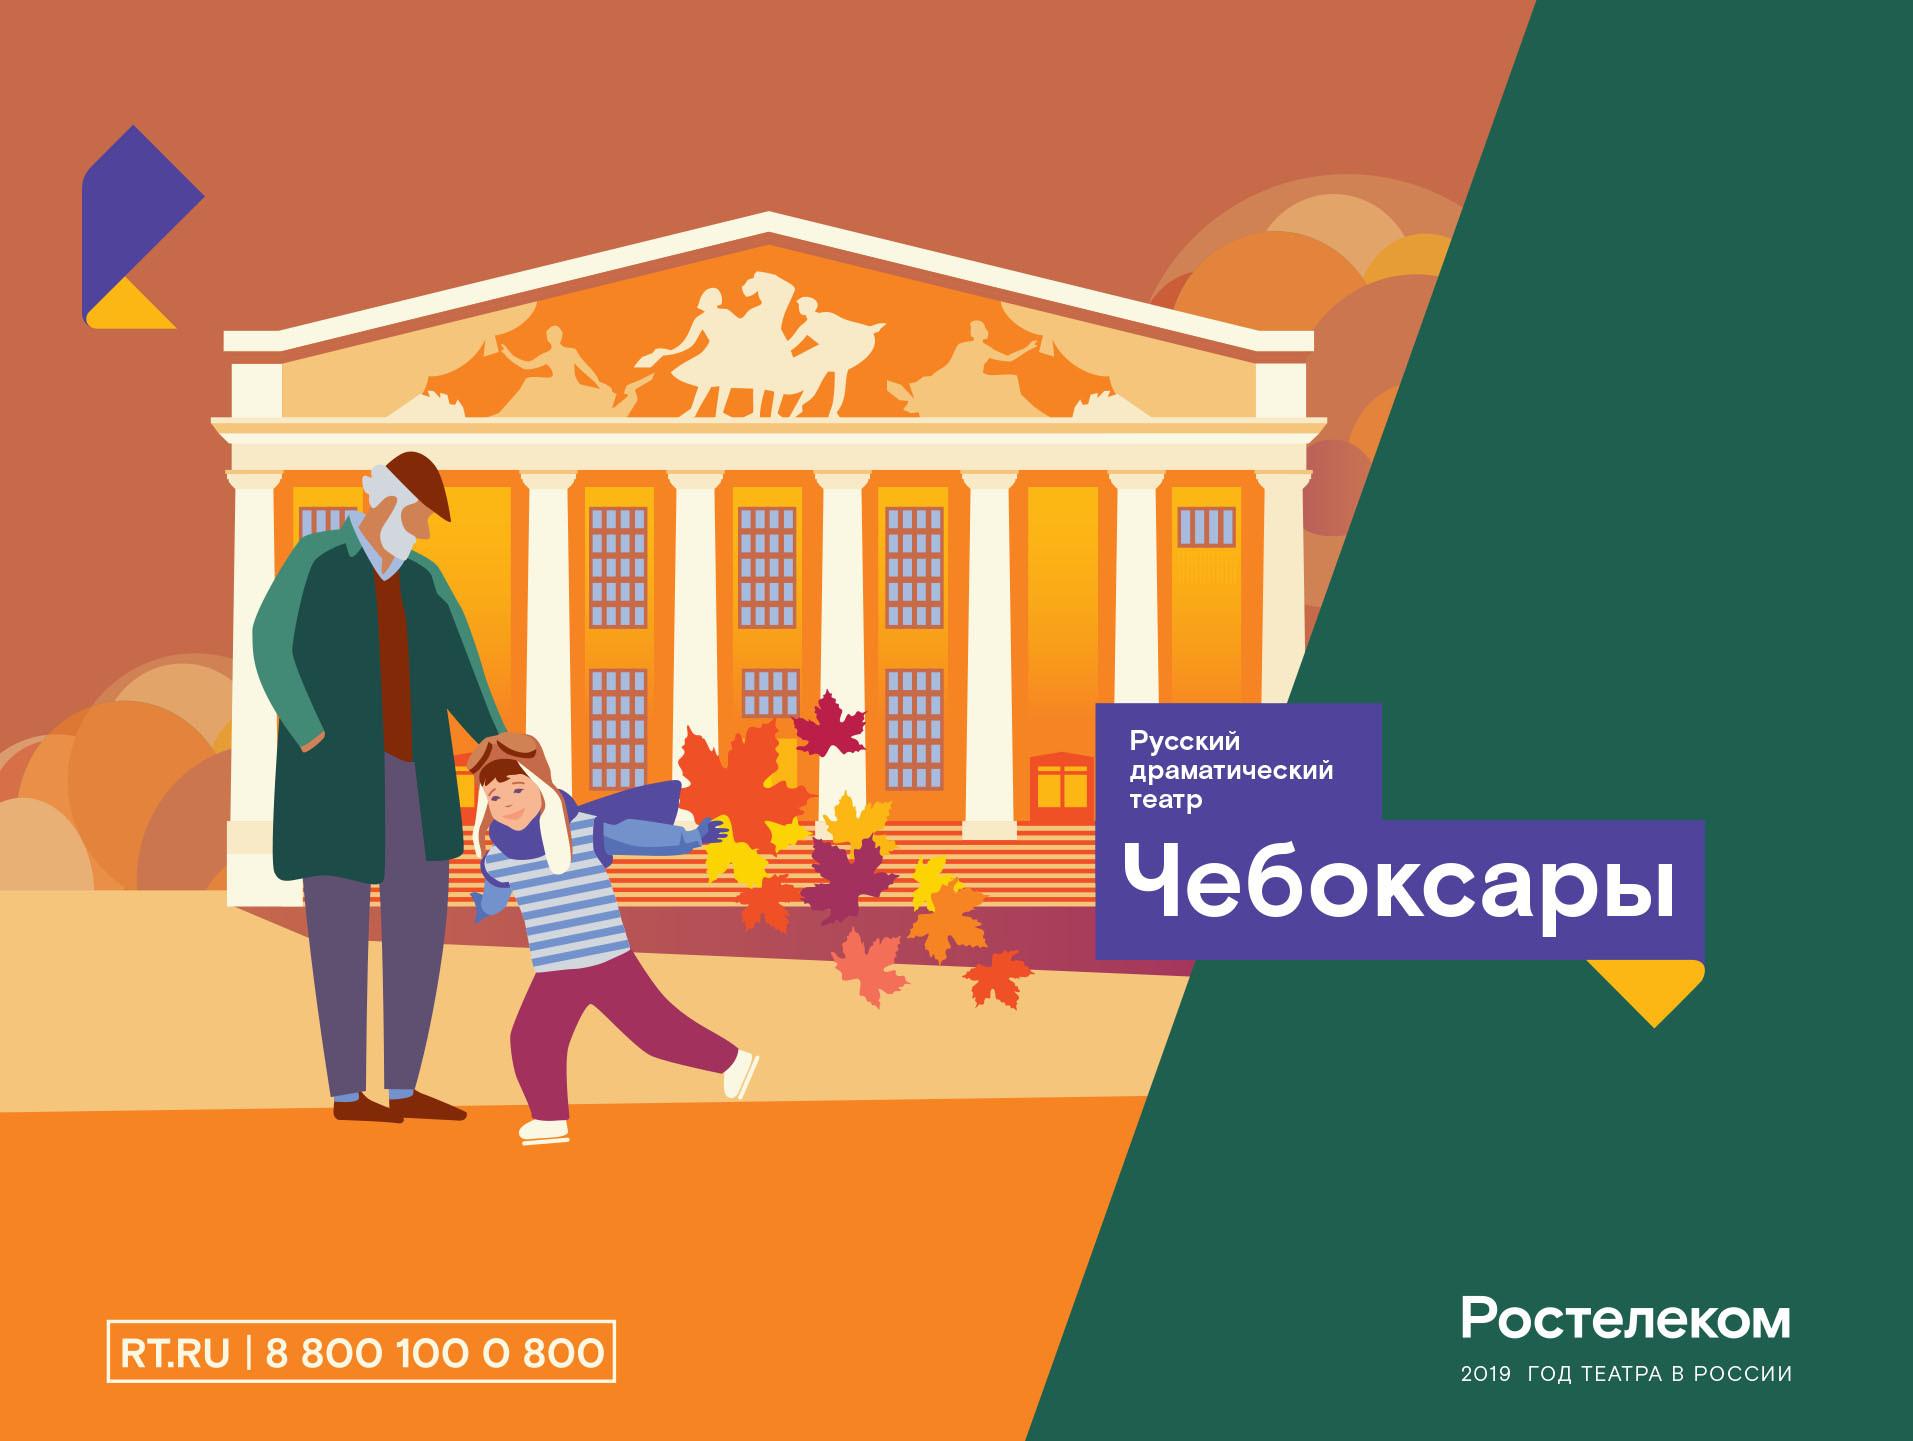 Axana zasorina rostelecom1 copy 10